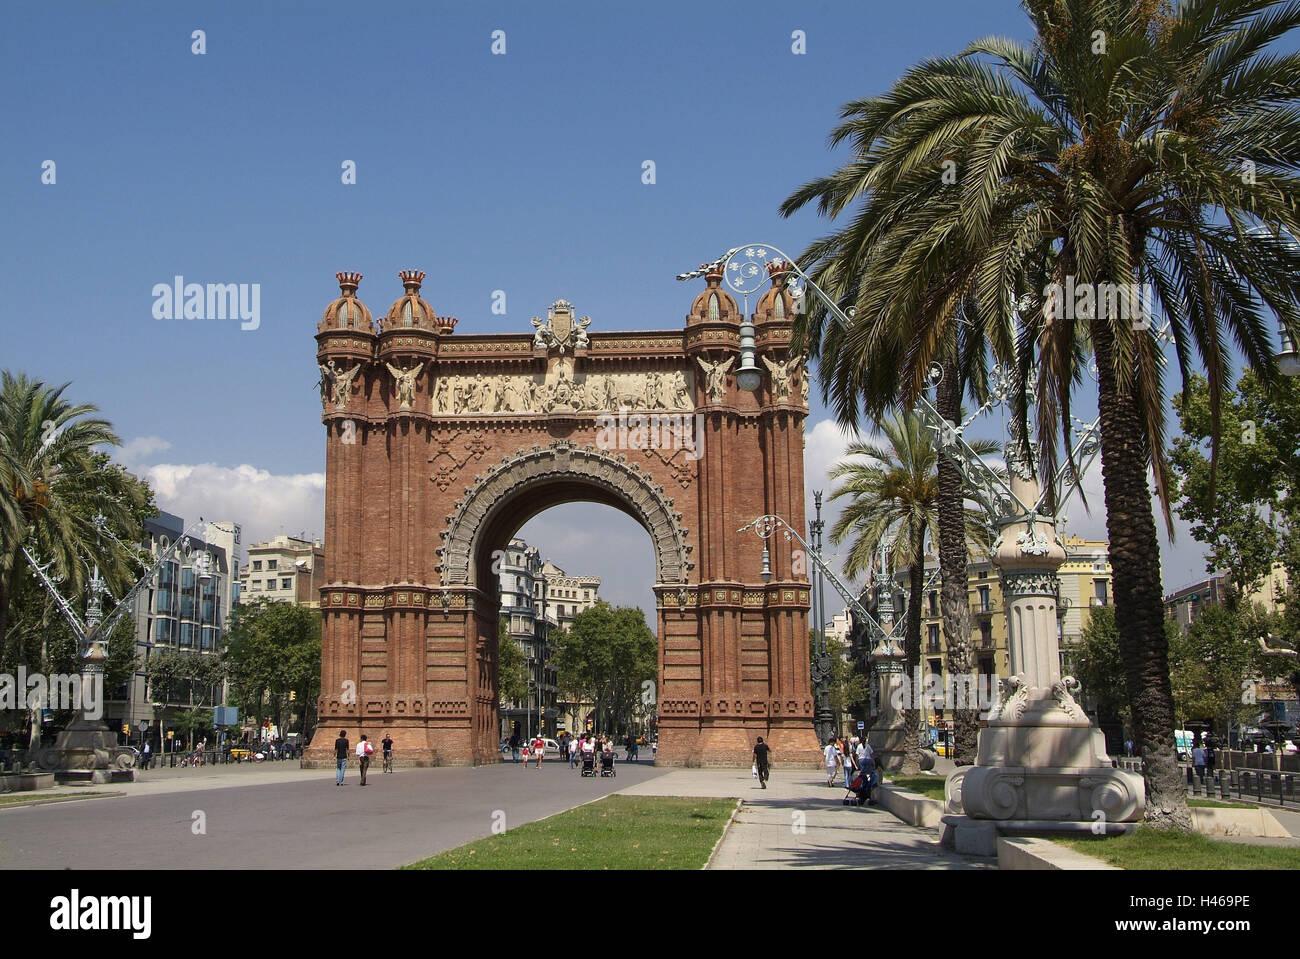 Spain, Catalonia, Barcelona, Passeig Lluis Companys, Arc de Triomf, - Stock Image